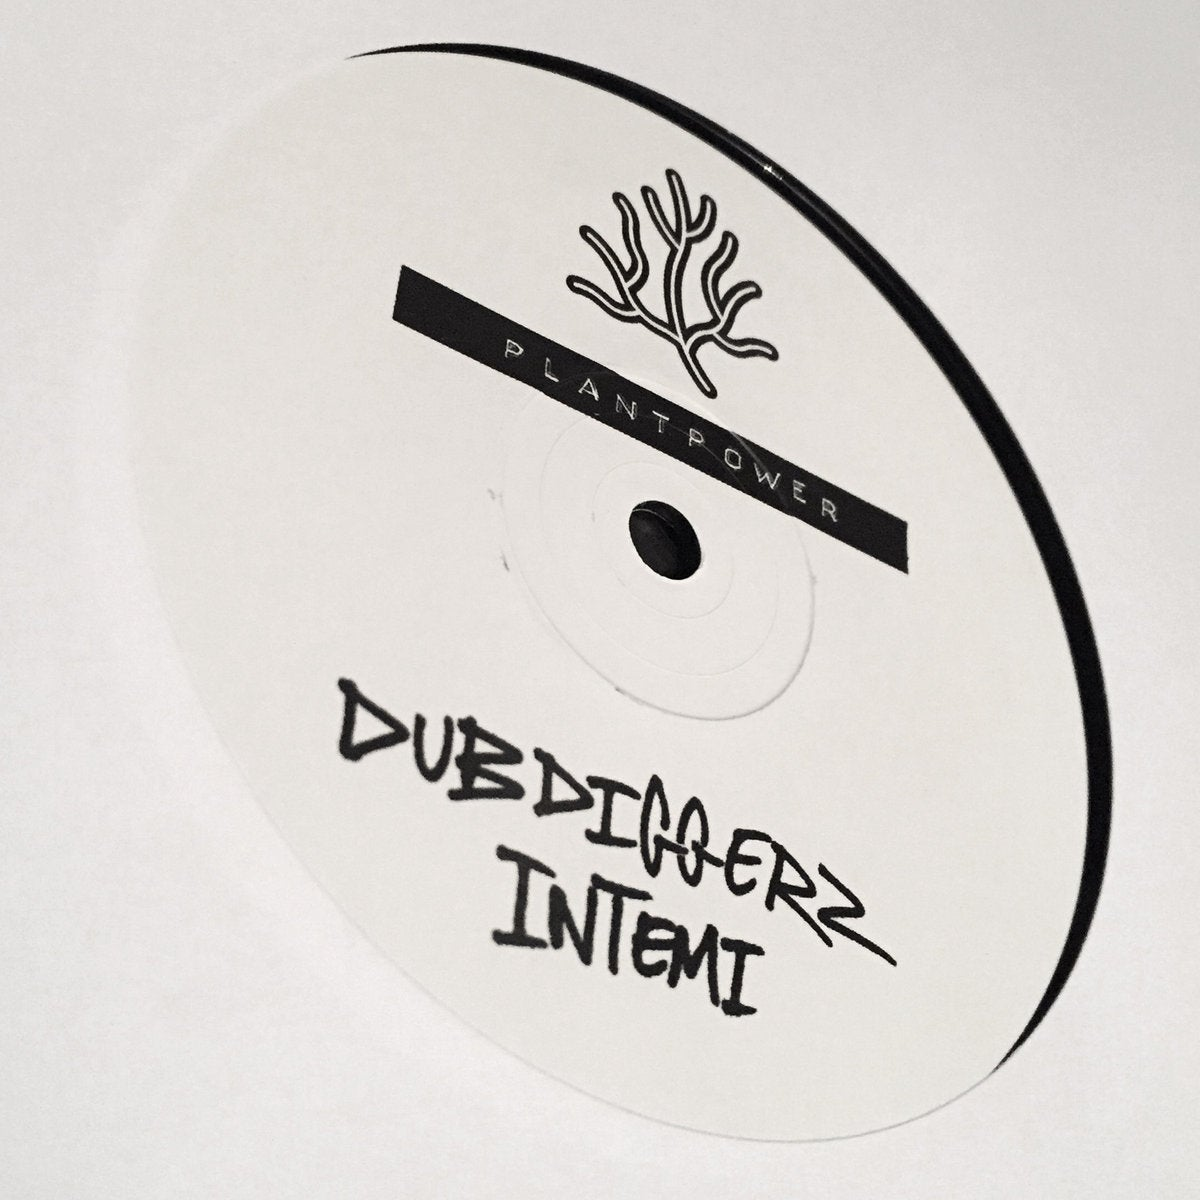 "Image of DubDiggerz - Spear Dub/ InTemi  12"" vinyl"